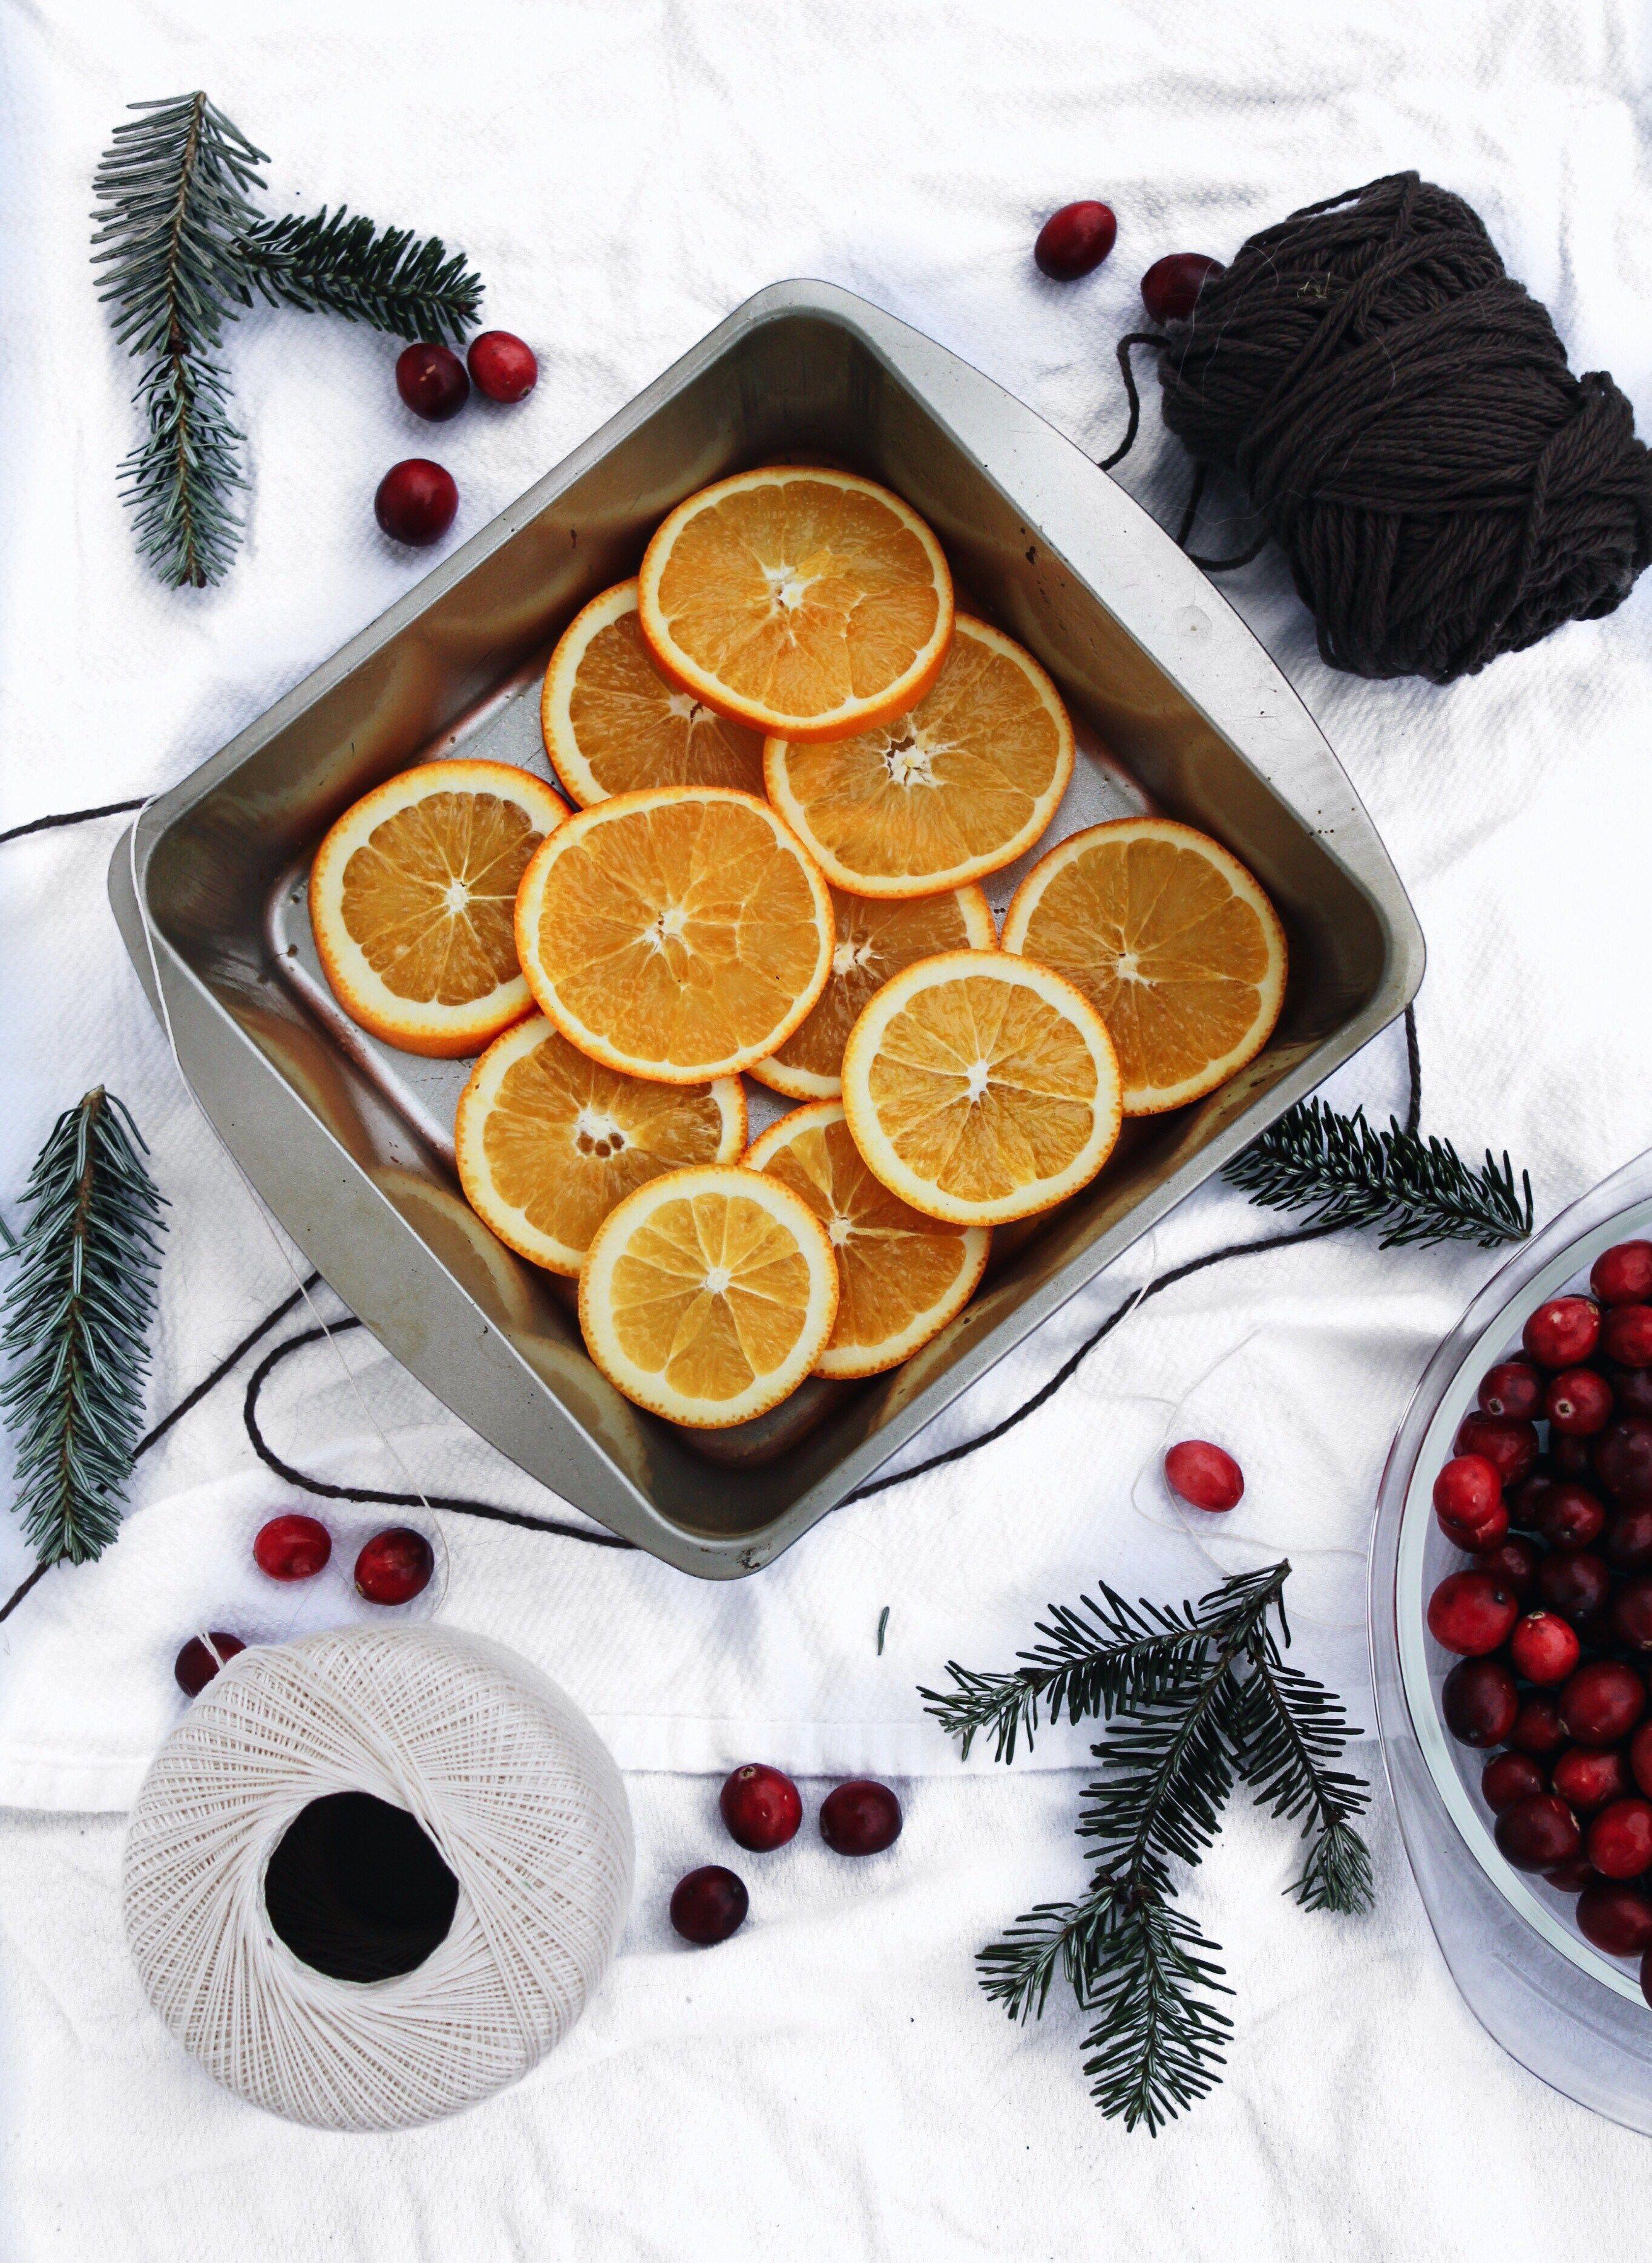 DIY Dried Orange + Cranberry Holiday Garland Orange